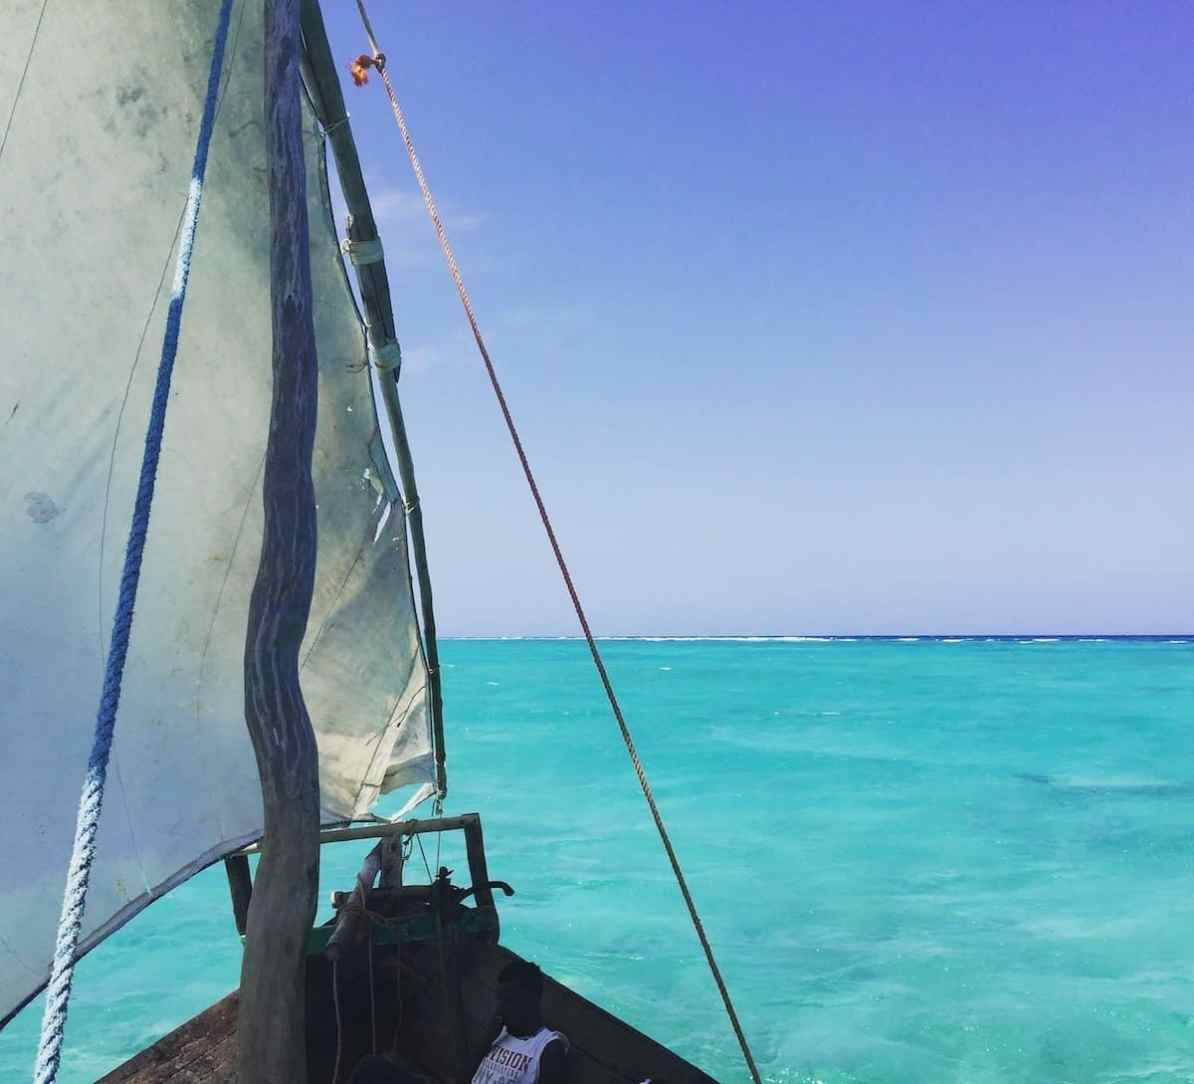 zanzibar adventure - dhow cruise